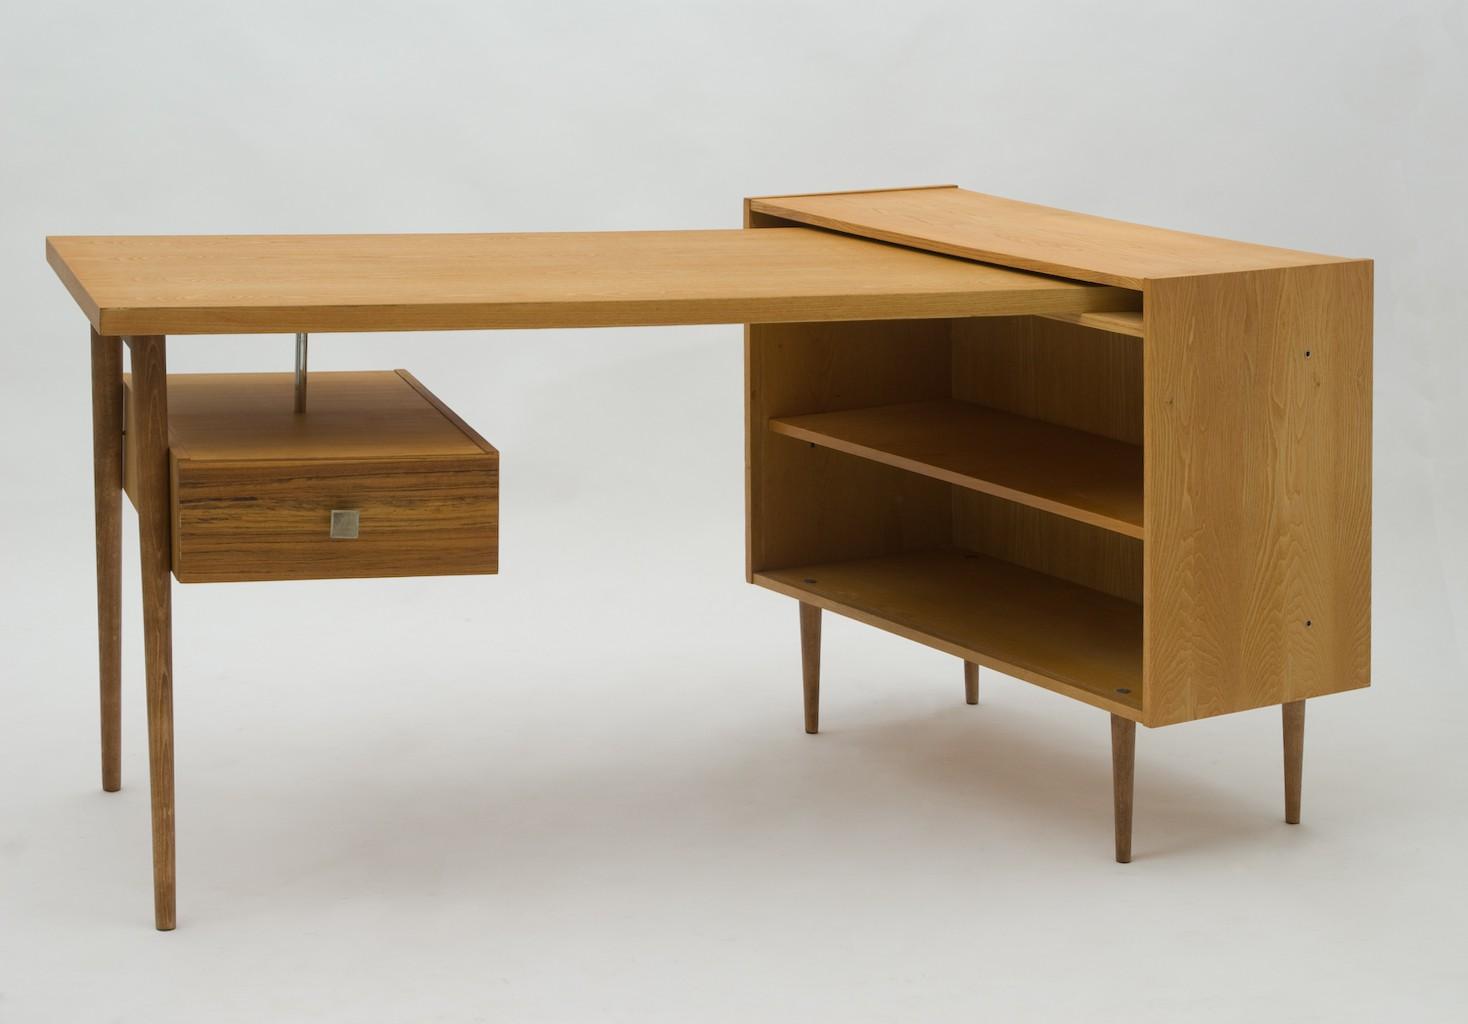 Český Nábytek Work Desk With Storage In Beechwood And Birch 1960s Previous Next